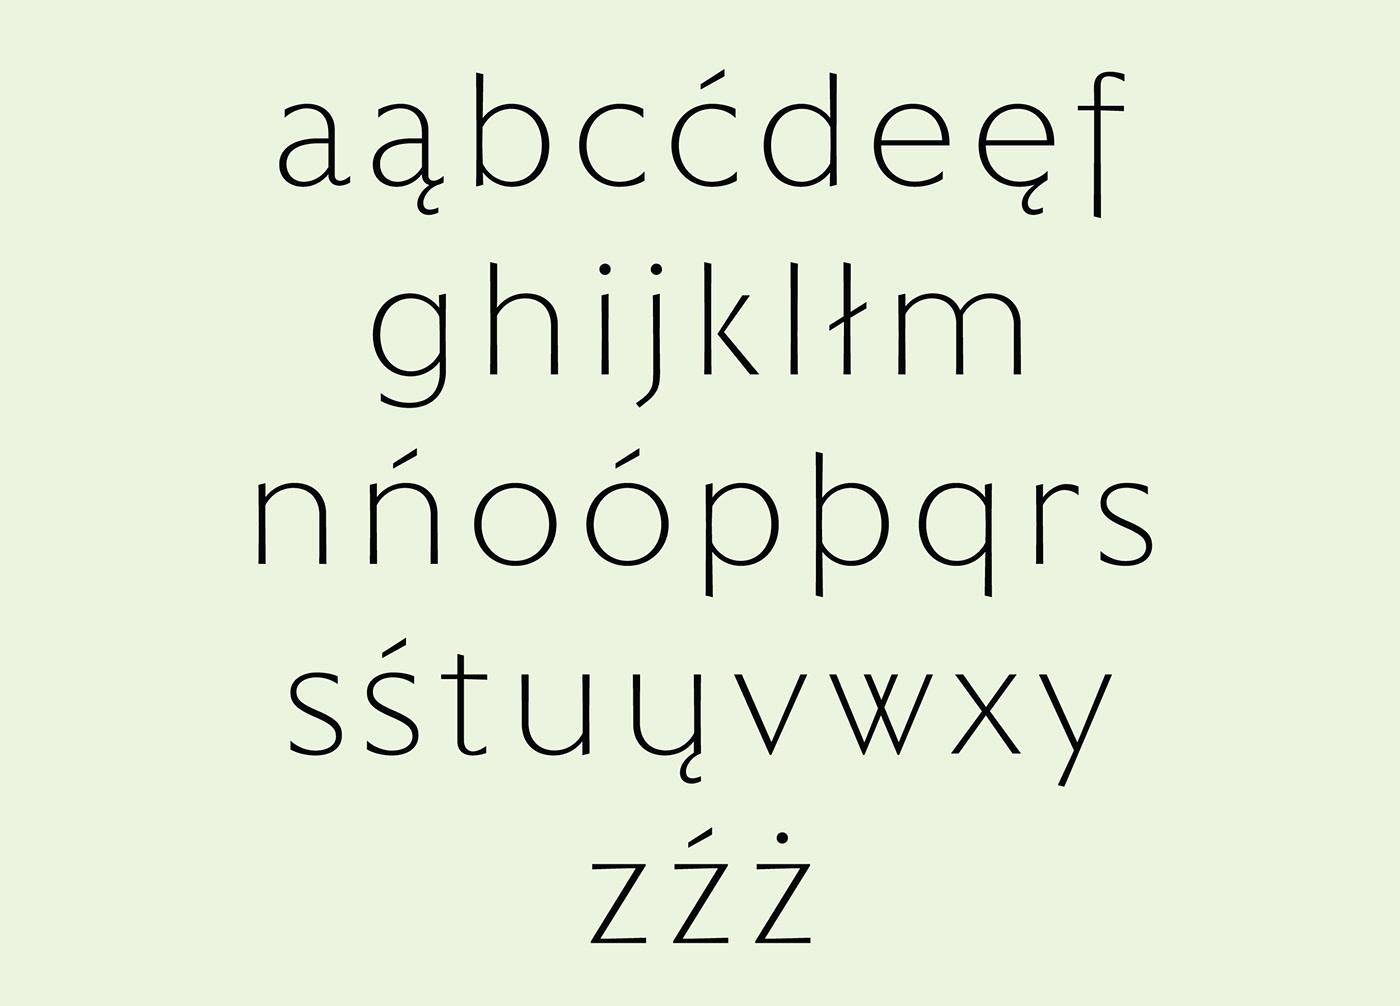 design font design Kyiv lettering letters Typeface ukraine custom font